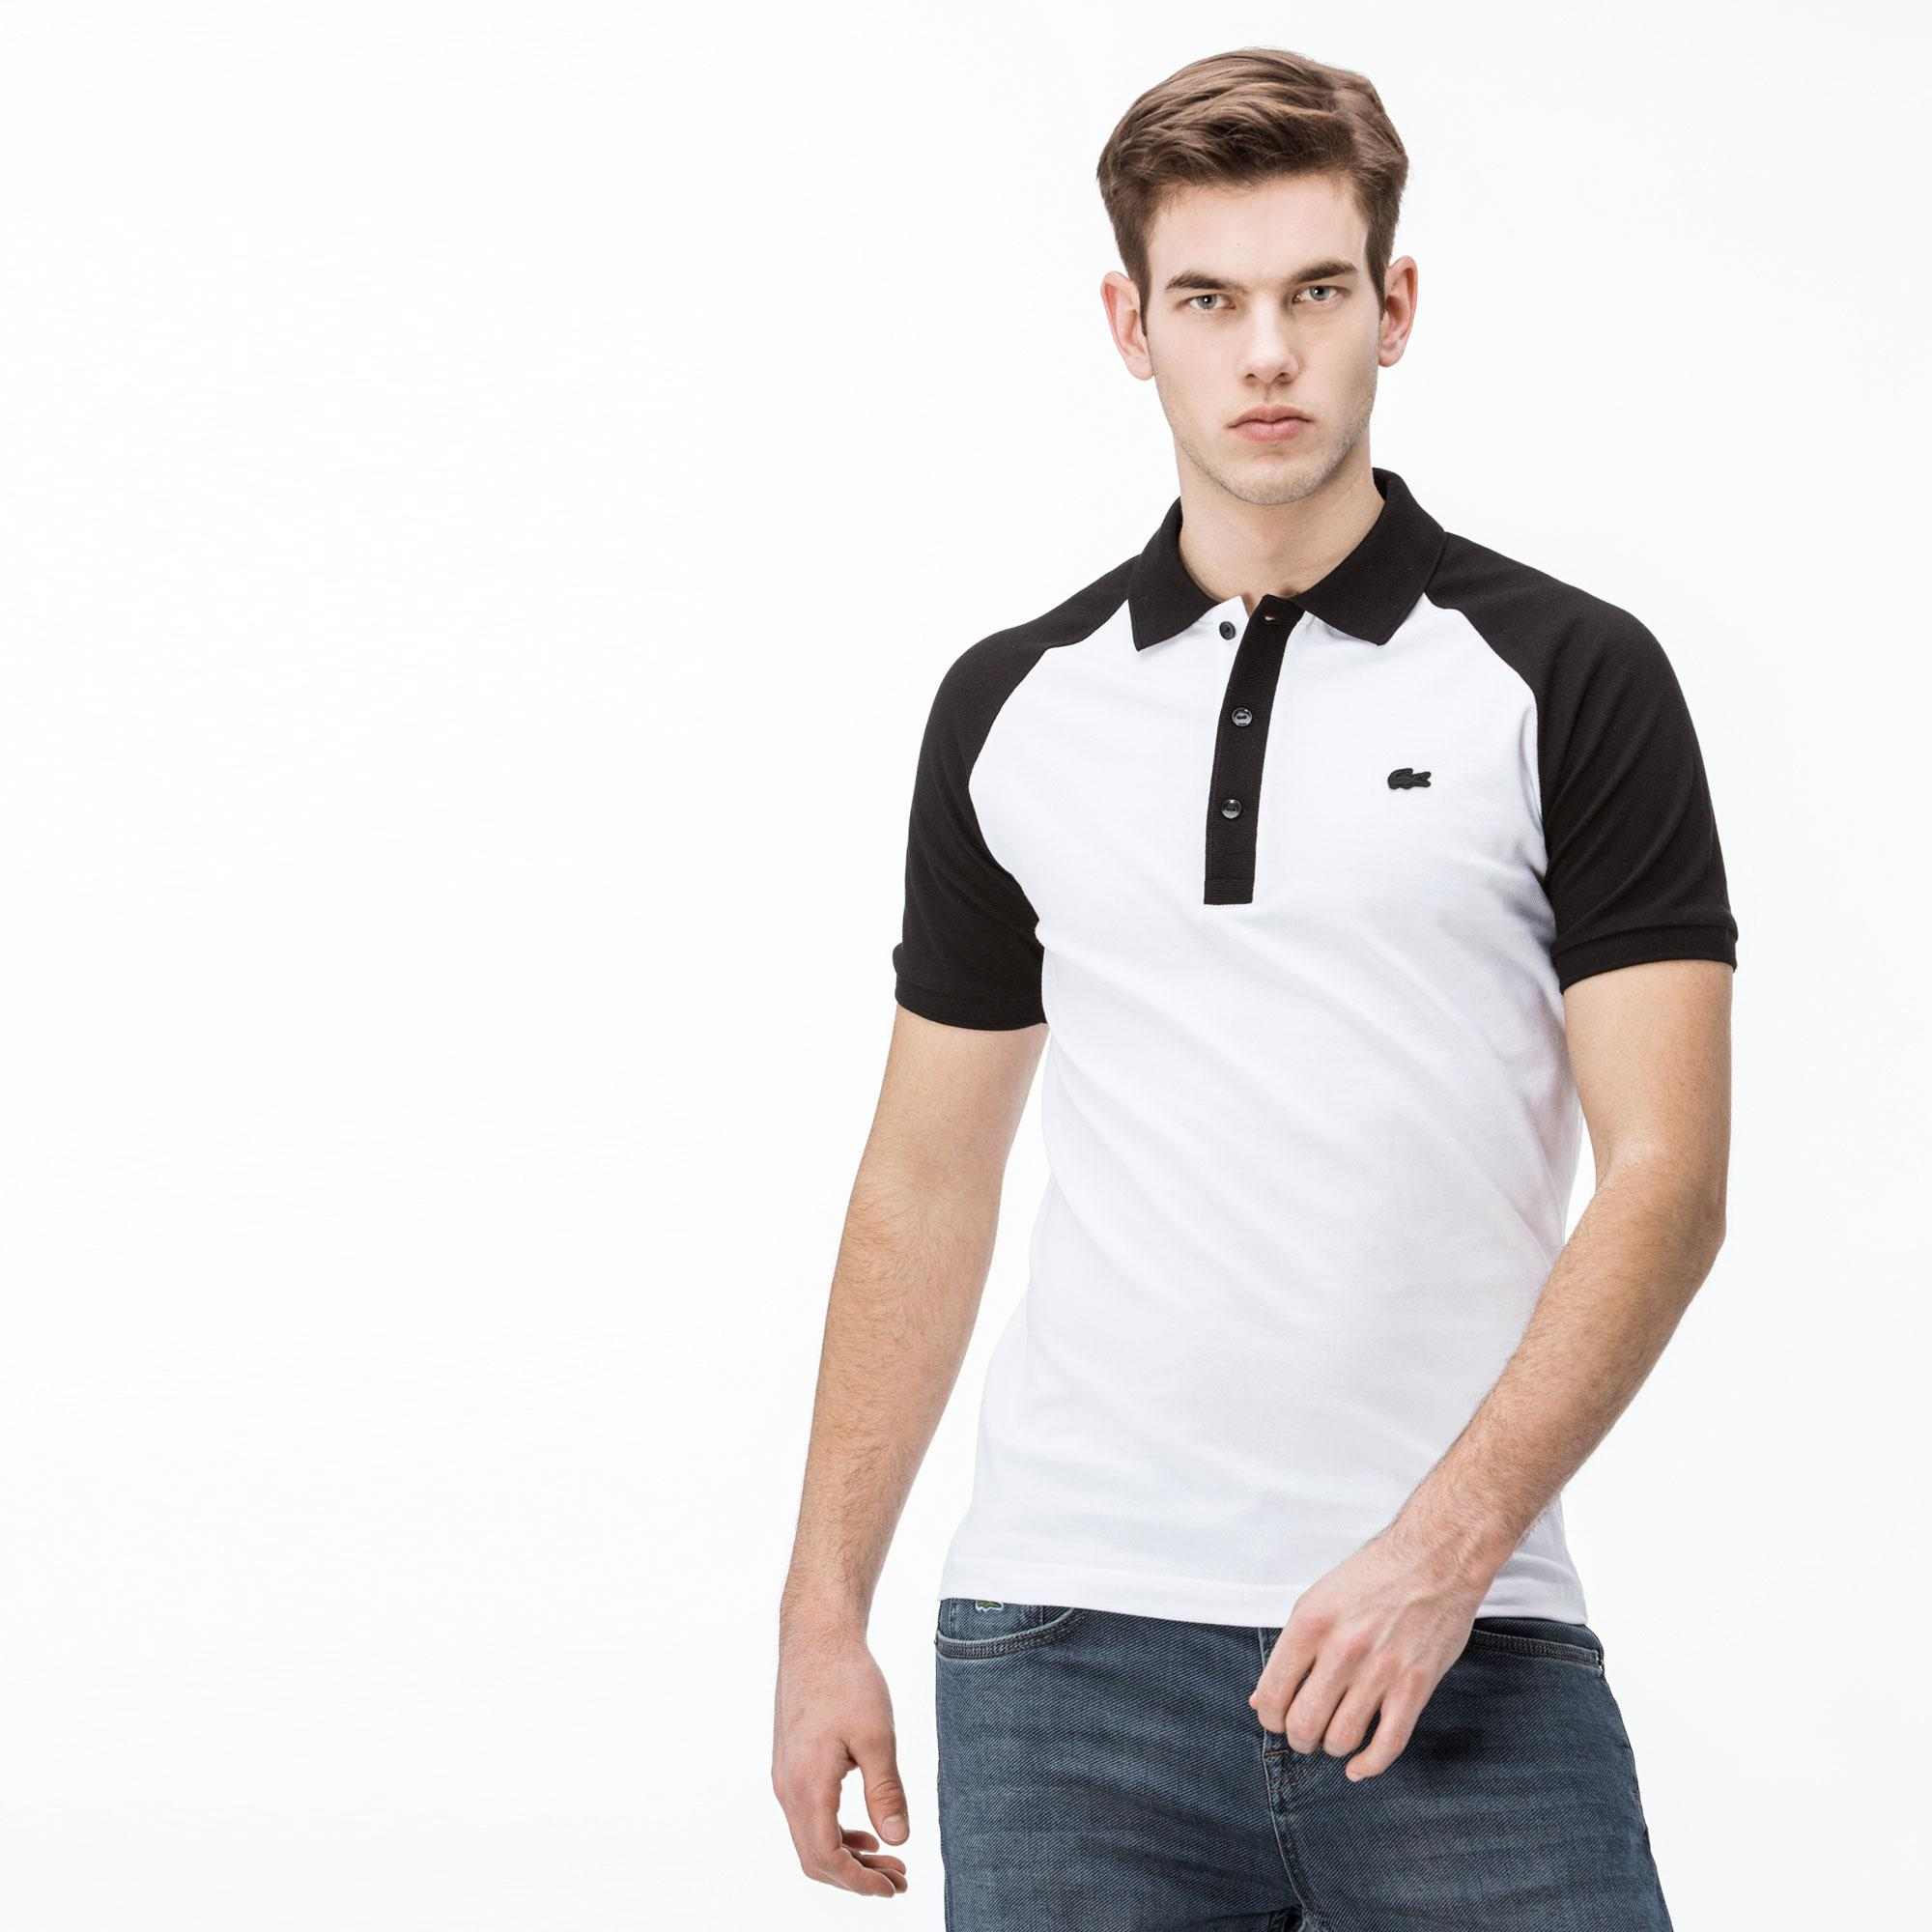 Lacoste Erkek Slim Fit Siyah - Beyaz Renk Bloklu Polo